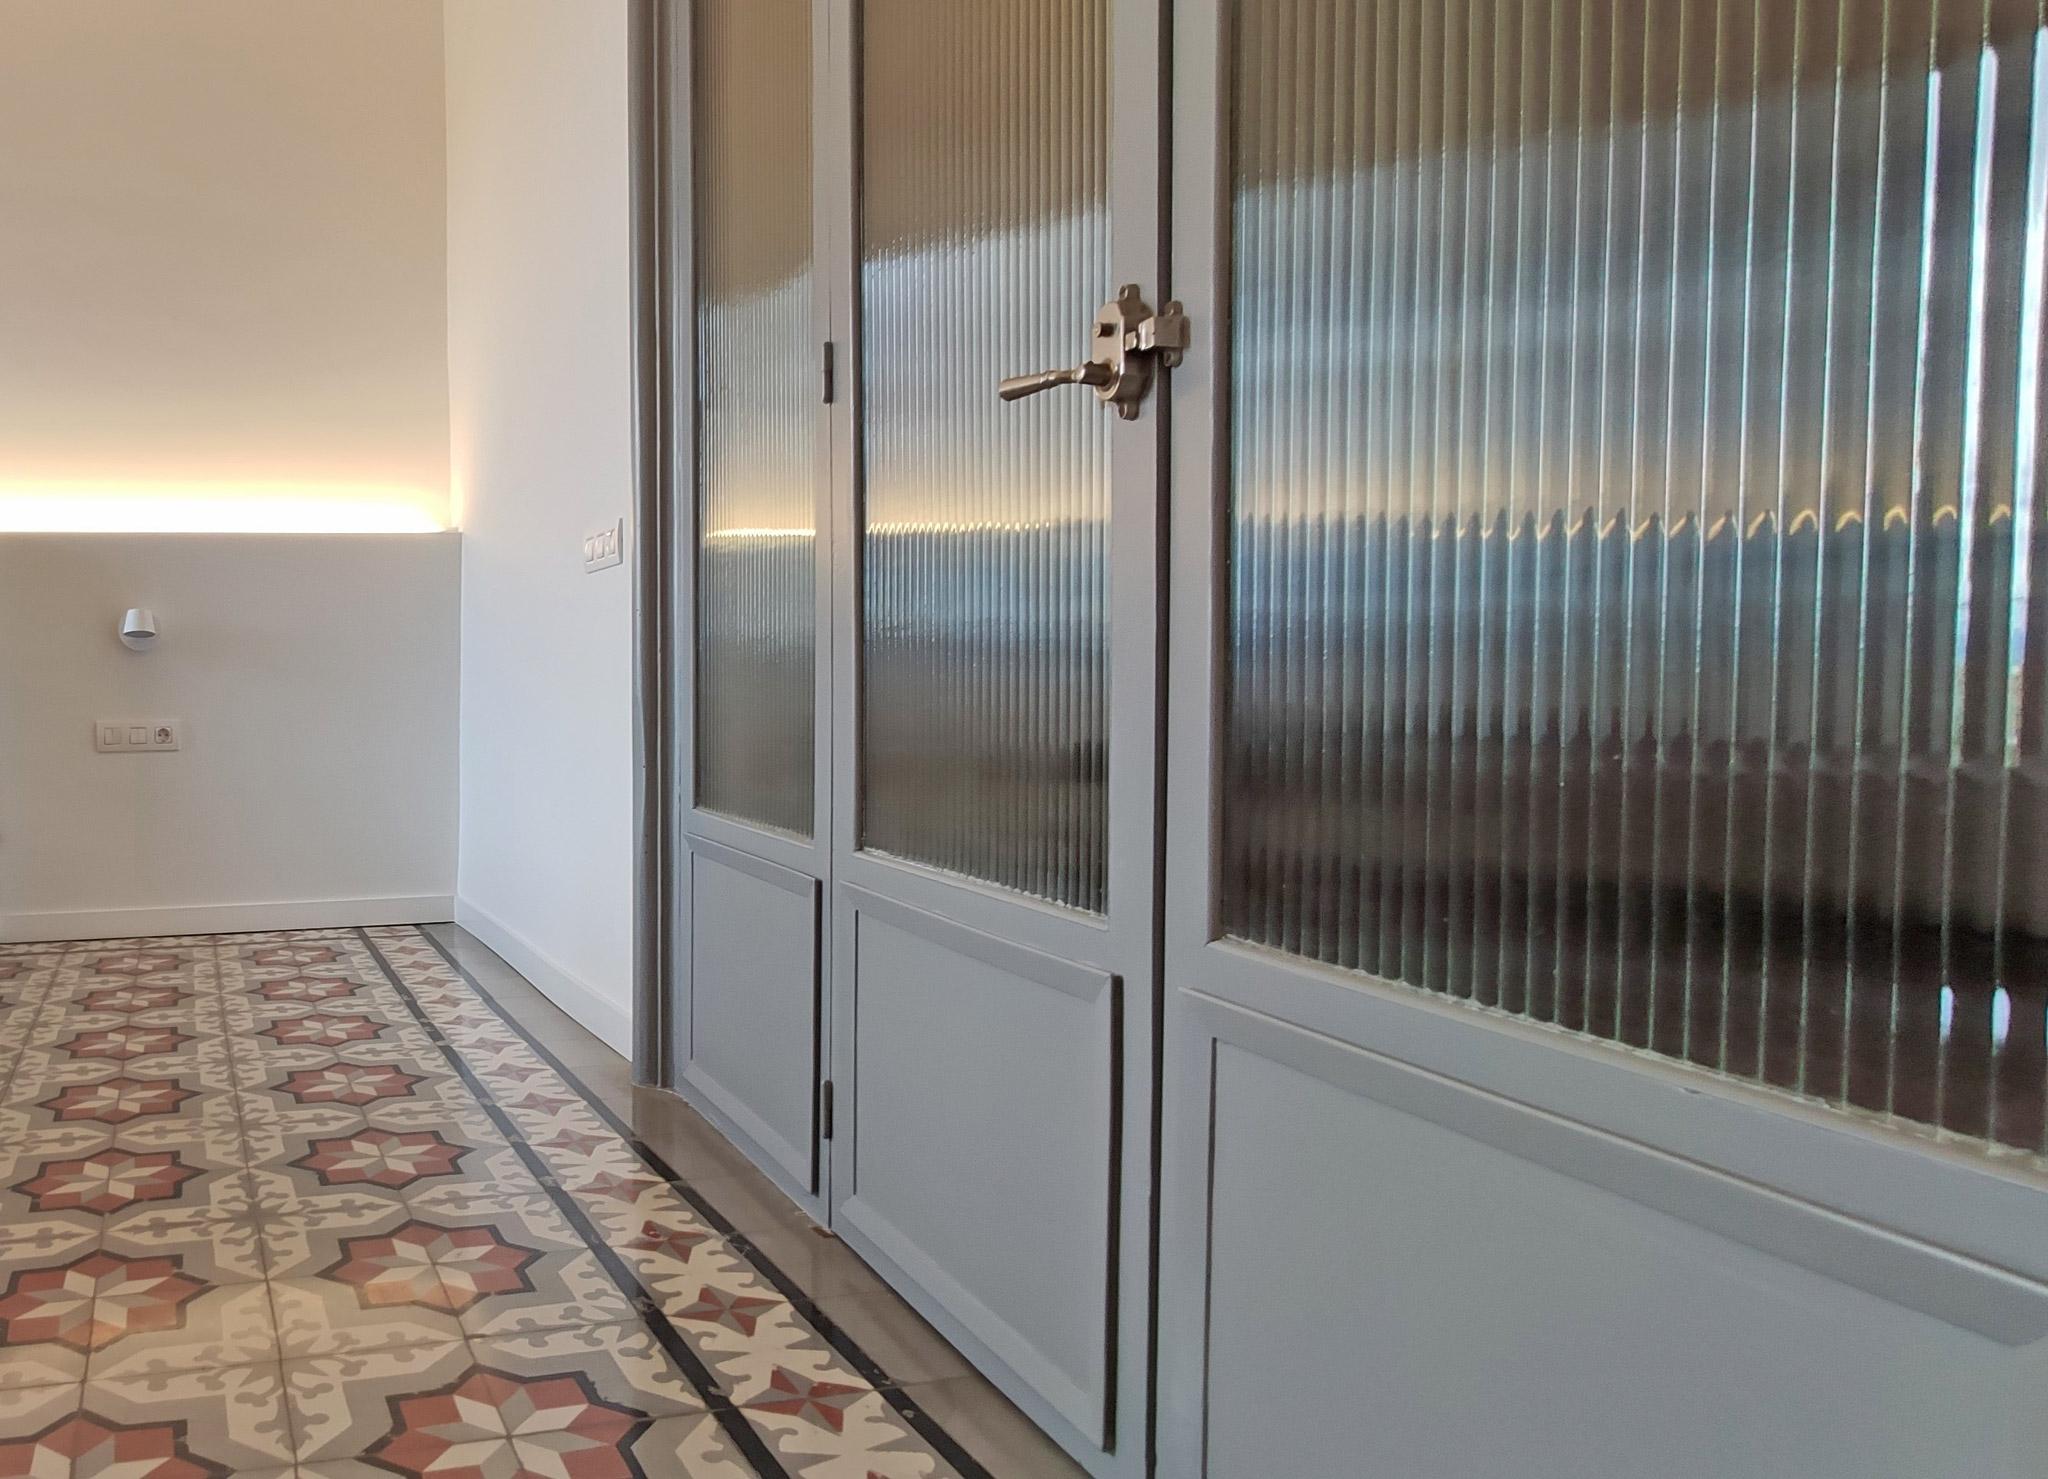 atelier4-anna-junca-interiorista-disseny-interiors-arquitectura-interior-interiorisme-banyoles-vestidor-dormitori-vic-costa-brava-barcelona-girona-emporda-reforma-4